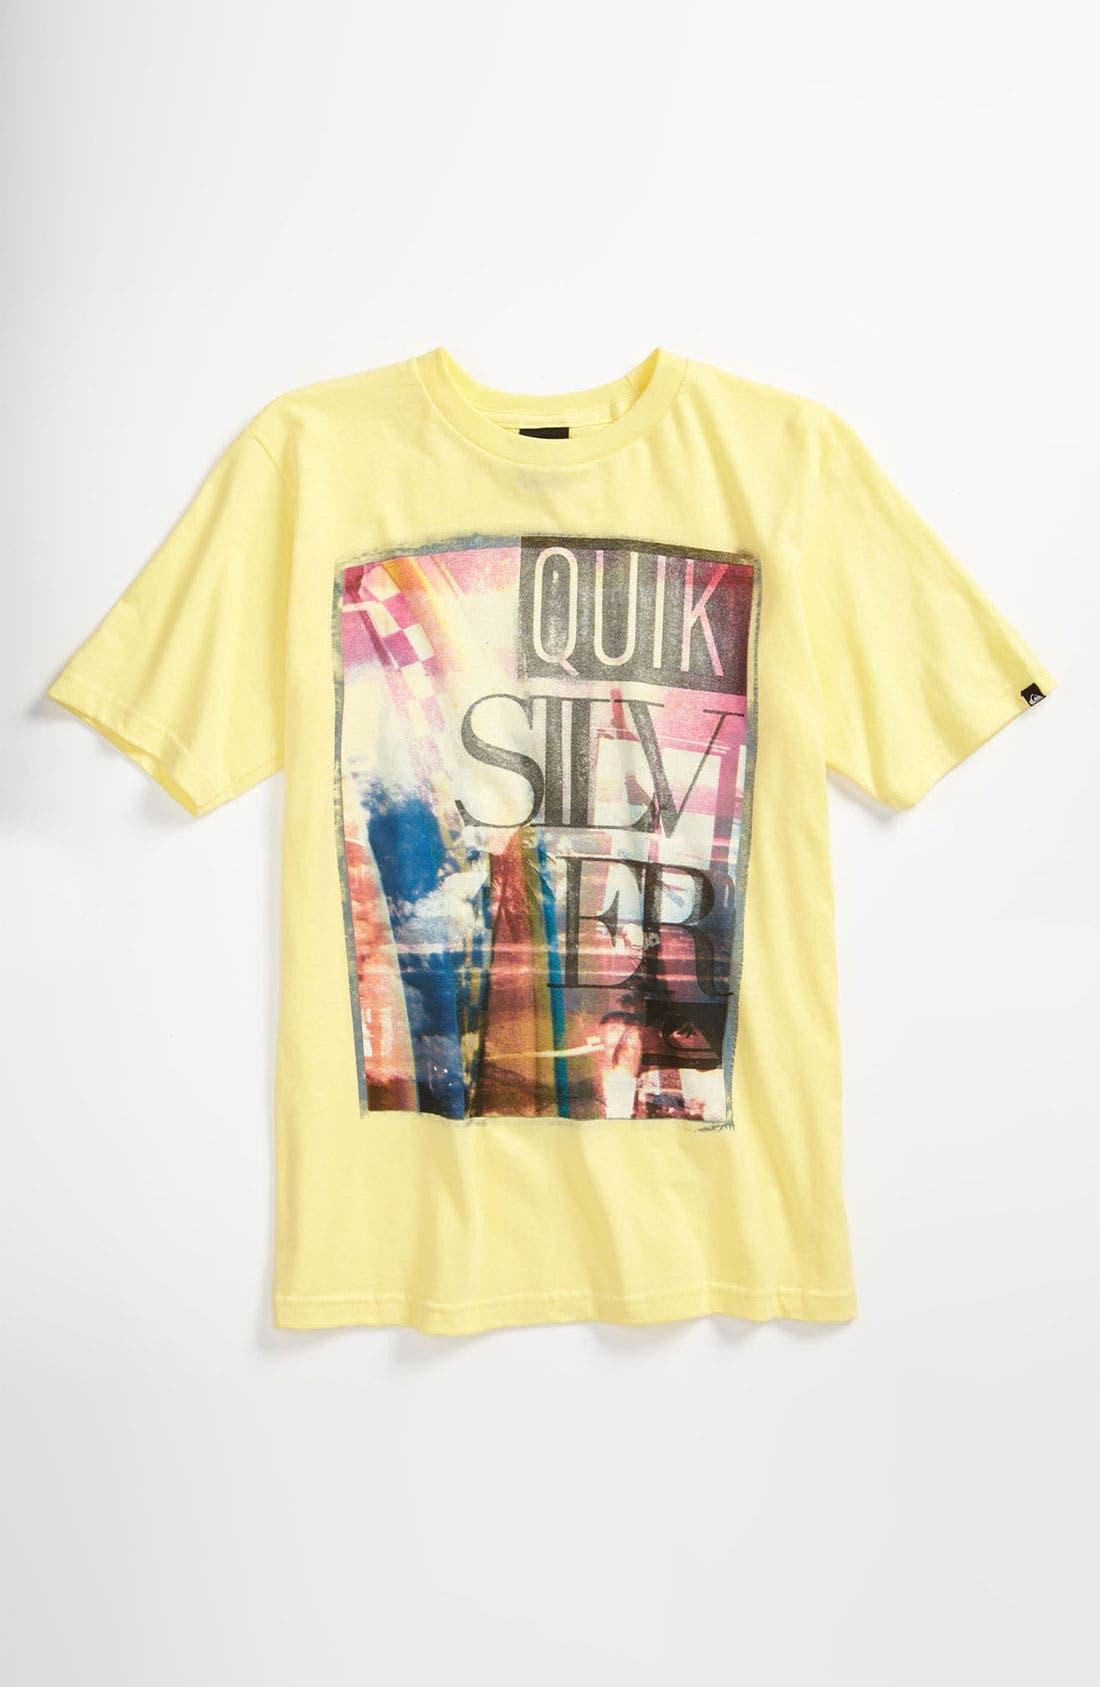 Alternate Image 1 Selected - Quiksilver 'Open Road' T-Shirt (Big Boys)